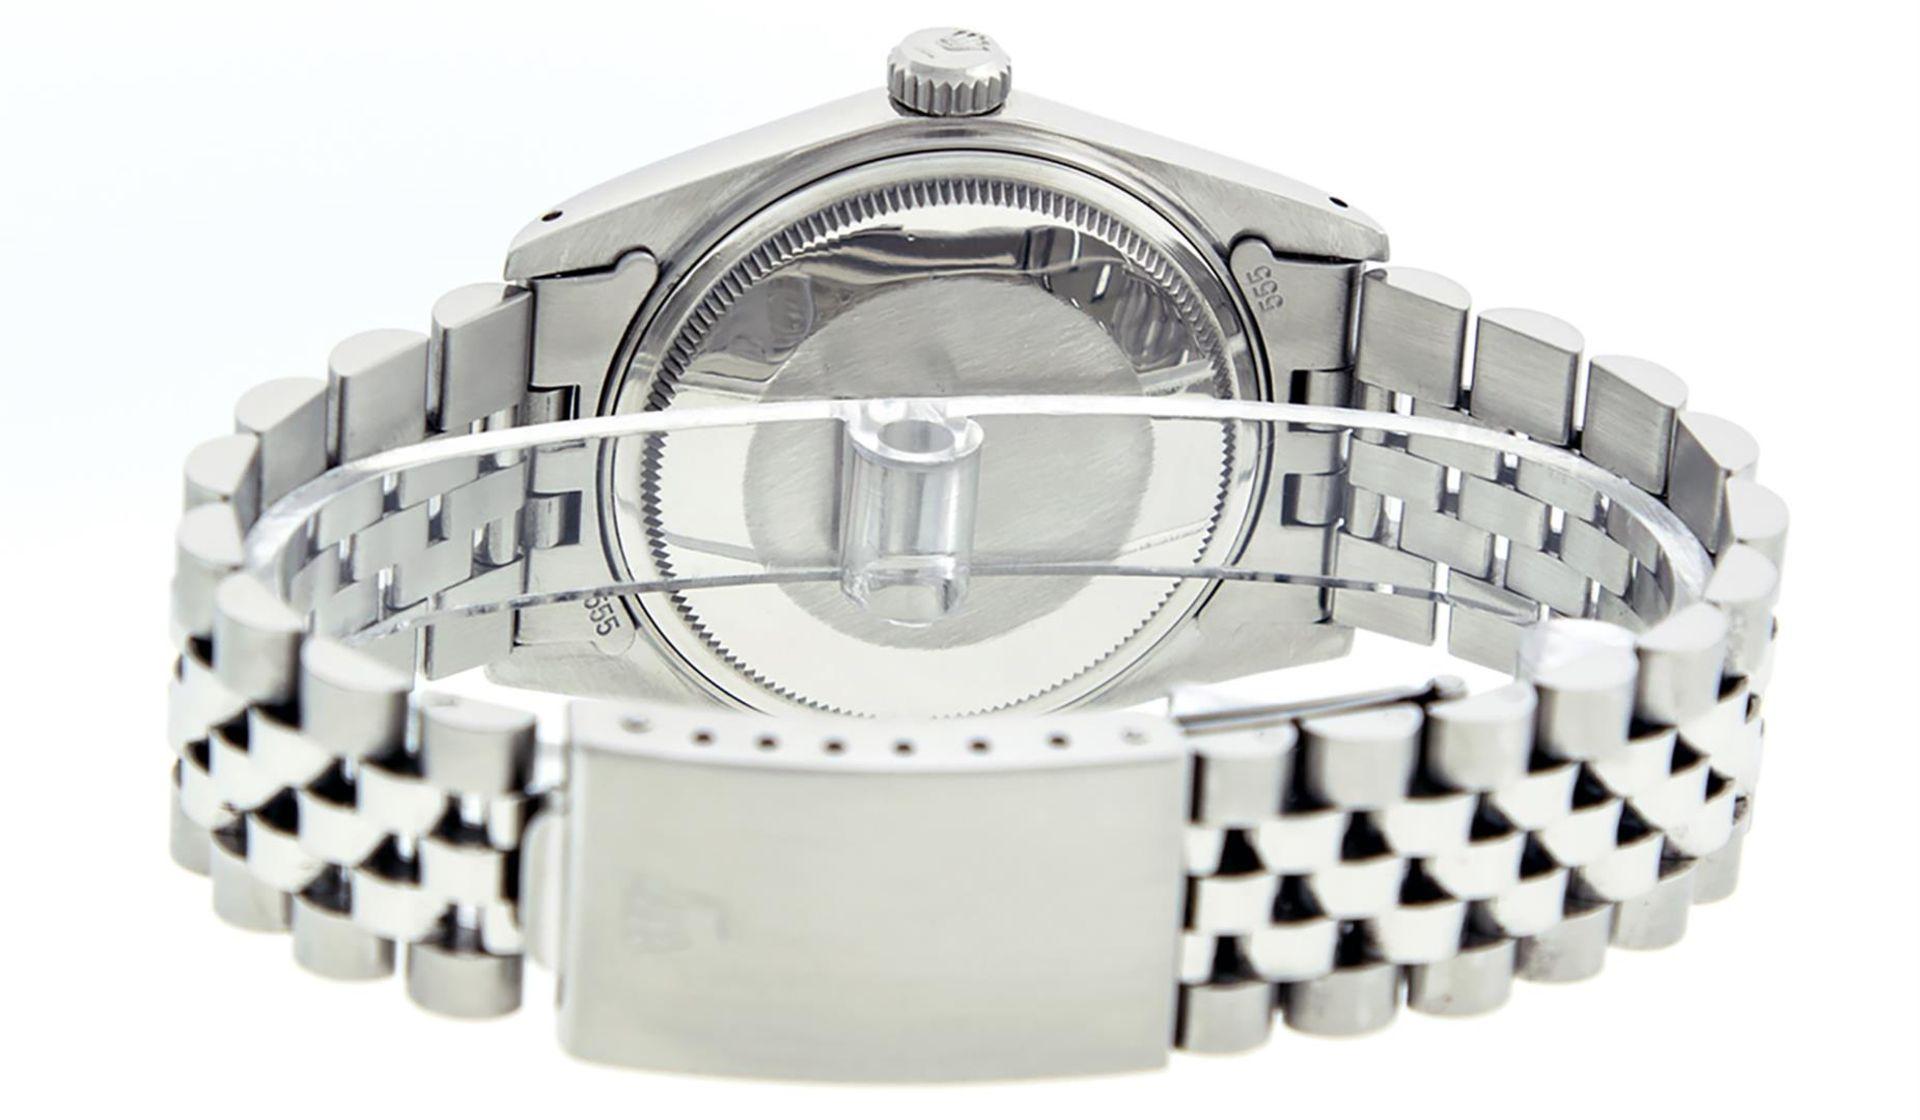 Rolex Mens Stainless Steel Ice Blue Diamond Datejust Wristwatch - Image 8 of 9